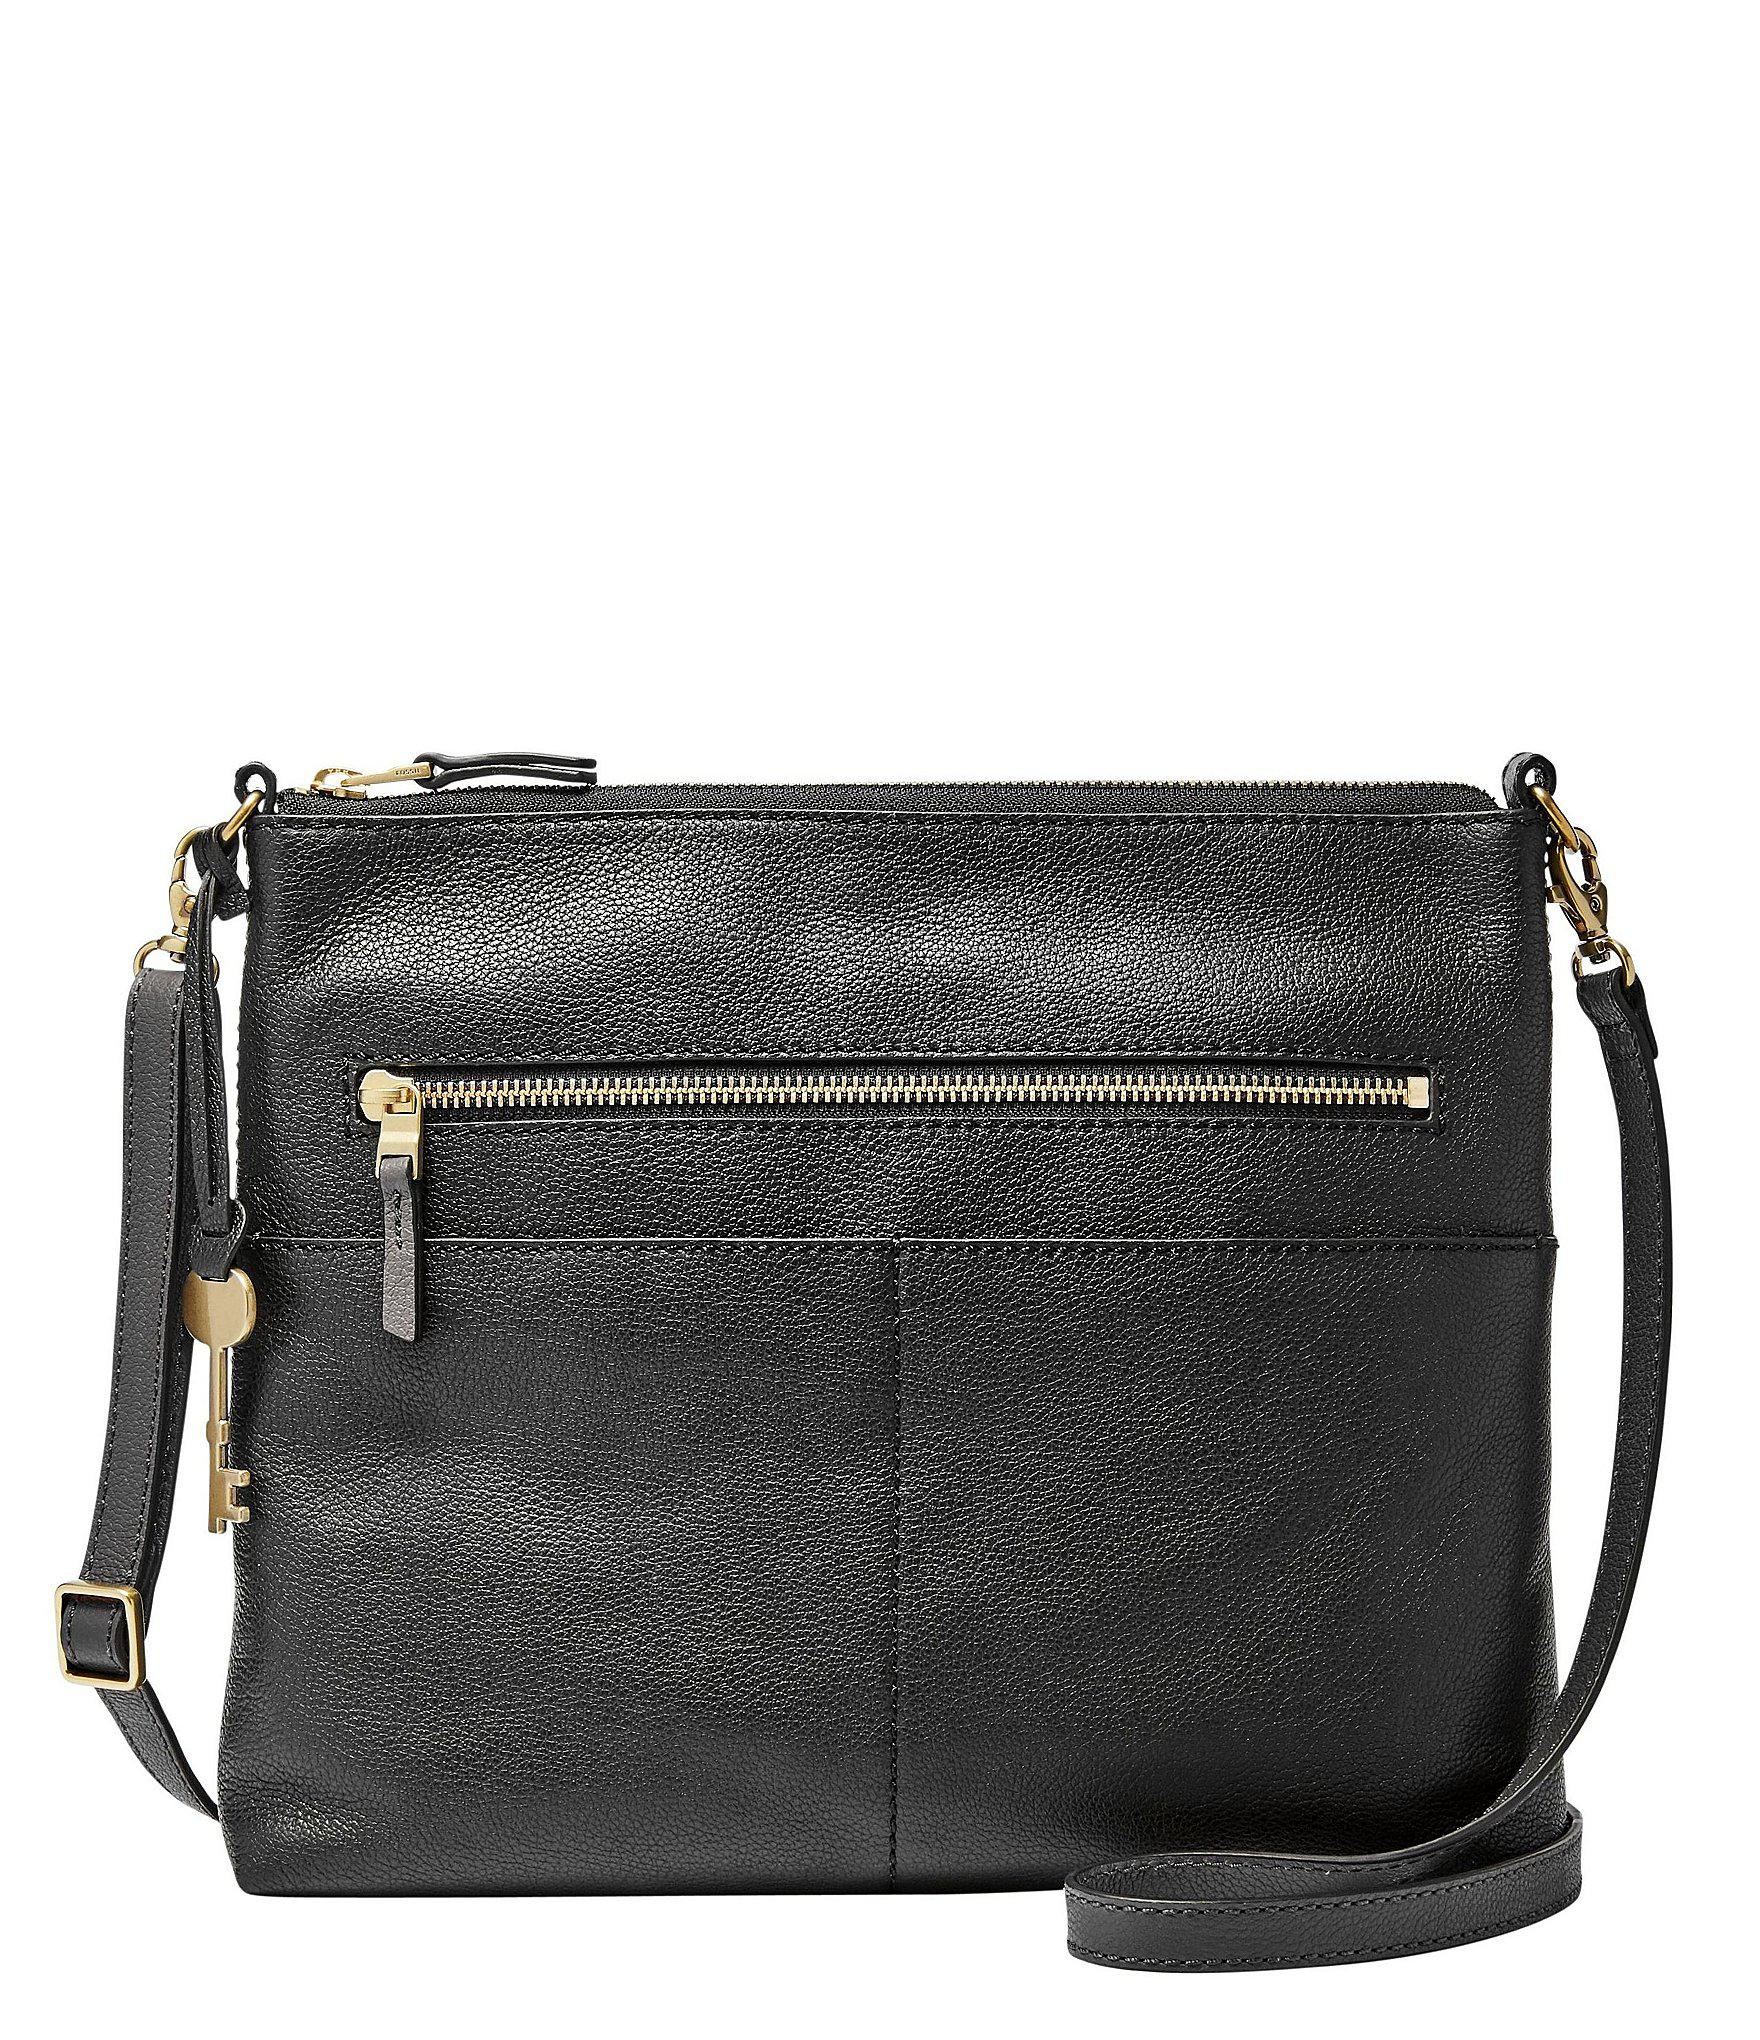 8359b6ca19a2 Women s Black Fiona Large Cross-body Bag